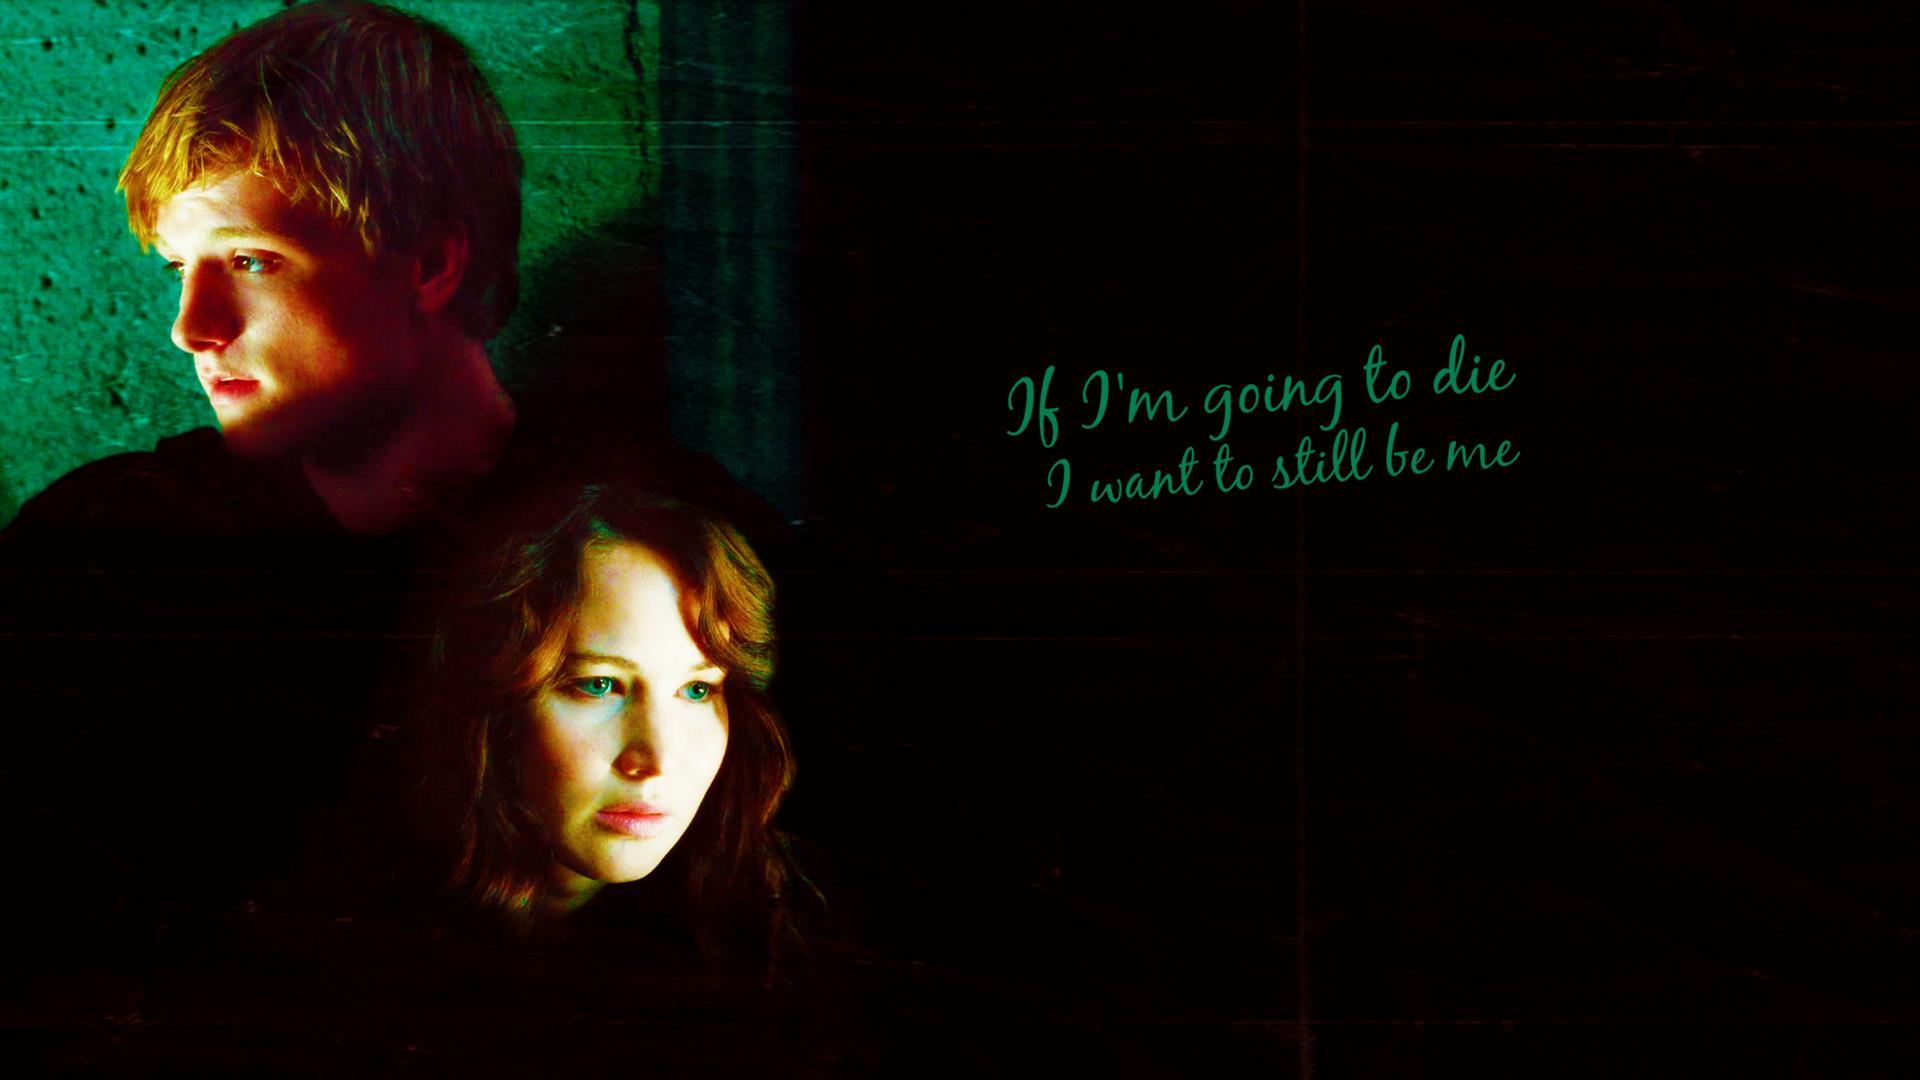 The Hunger Games Wallpaper Desktop Image 1920x1080